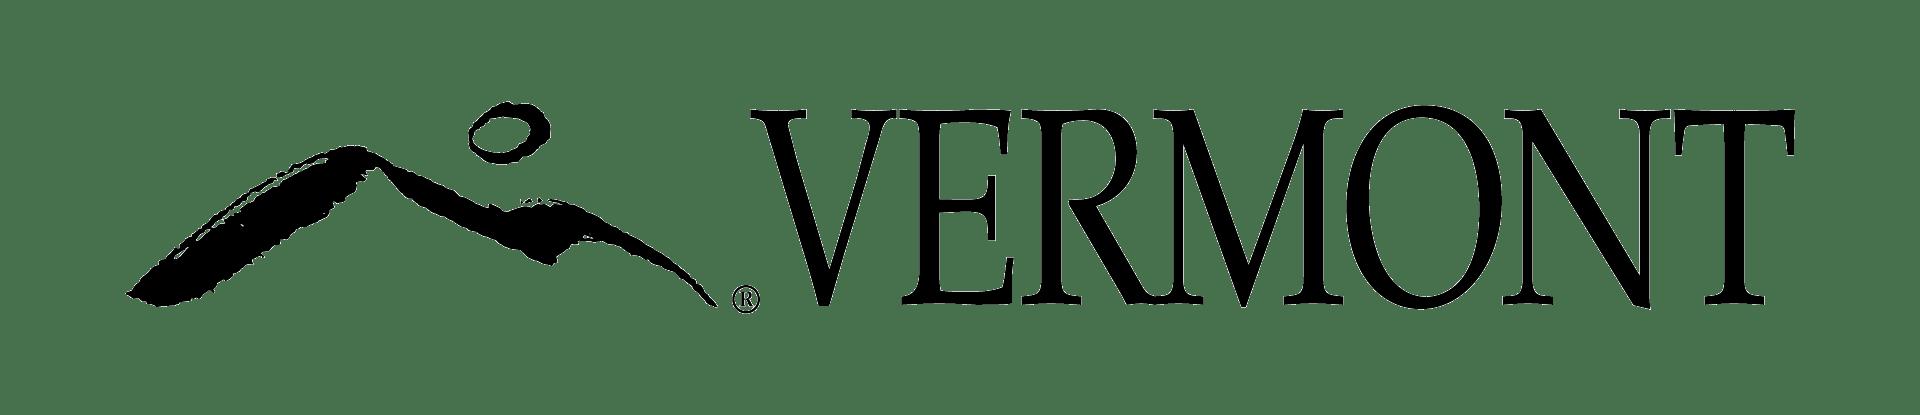 Vermont MOM Logo Horizontal K 1920x415 b39b9b72 2740 4314 aa46 3e8d59c0d1411